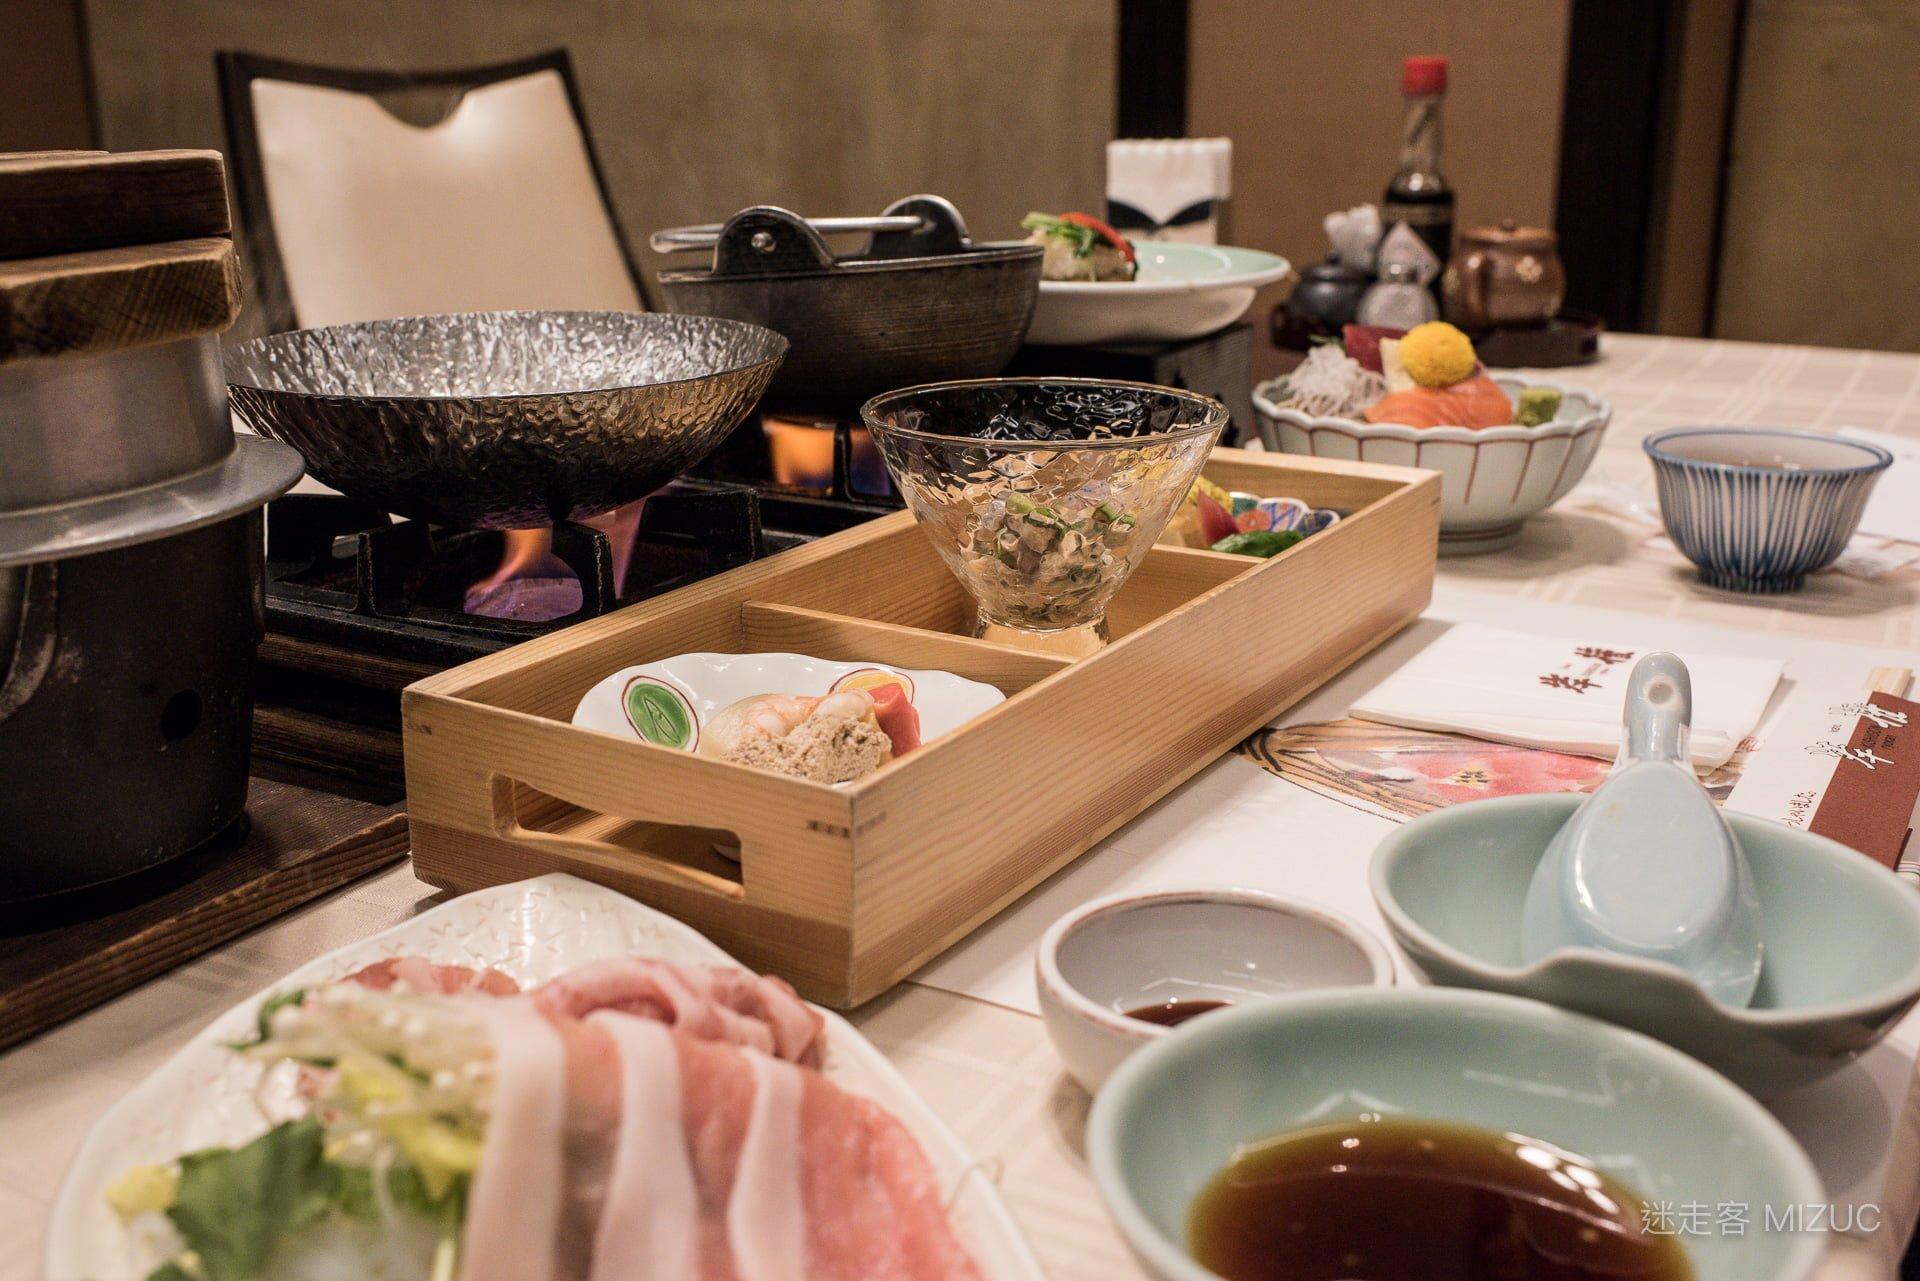 201711 Ibaraki Tochigi Gunma Japan Travel By RentalCar 69 日本自駕旅遊/北關東三縣「茨城、櫪木、群馬」秋天美食、溫泉與瀑布秘境百景(精選照片分享)